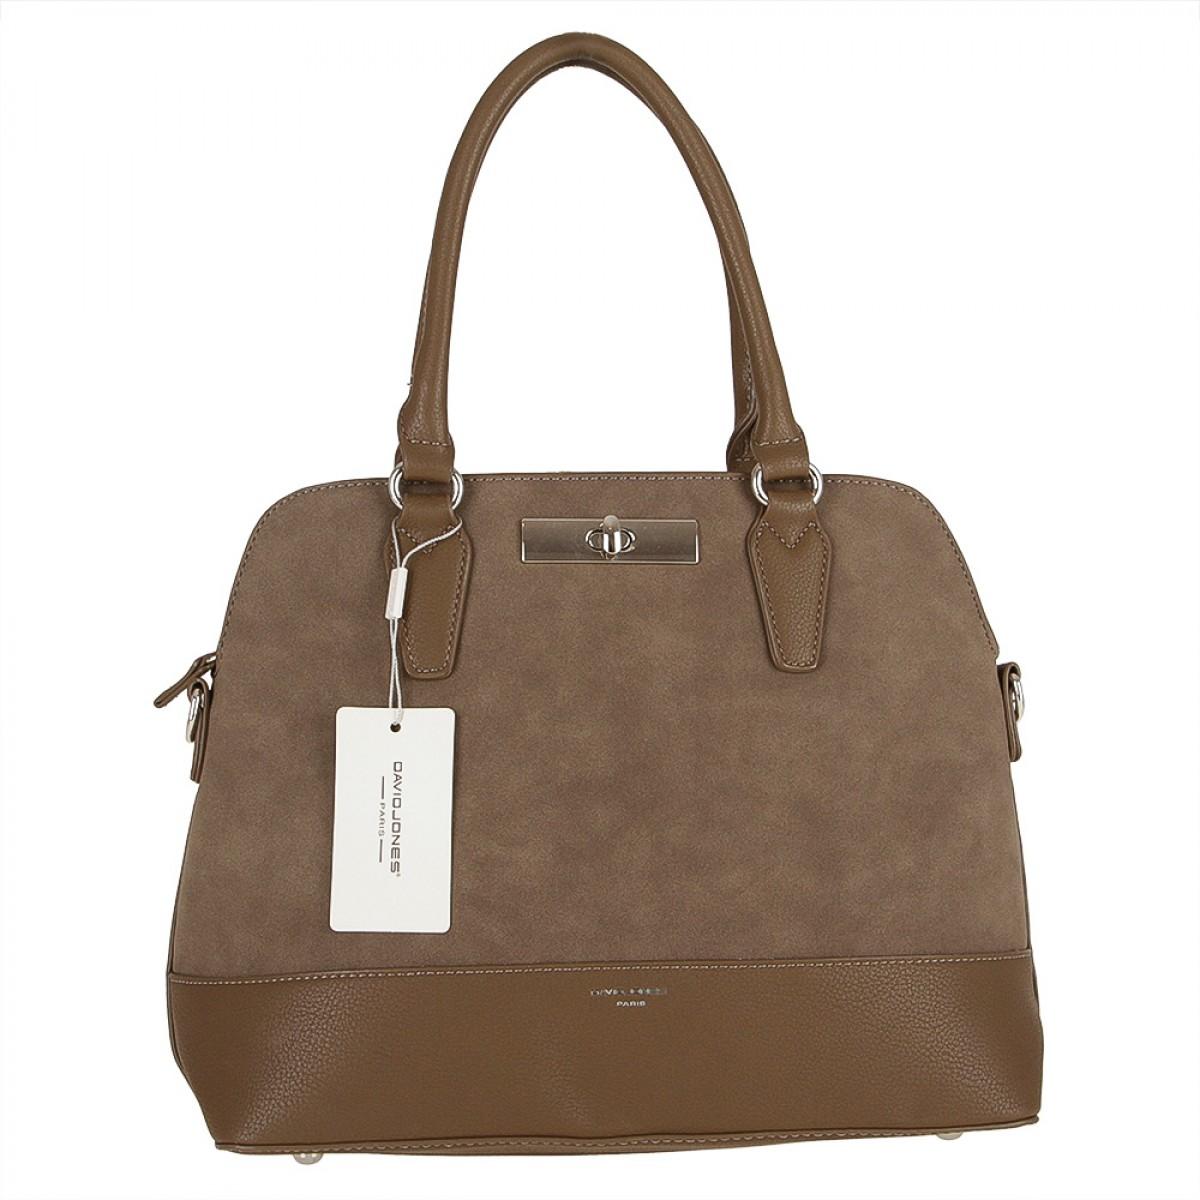 Жіноча сумка David Jones 5608-1 D.TAUPE